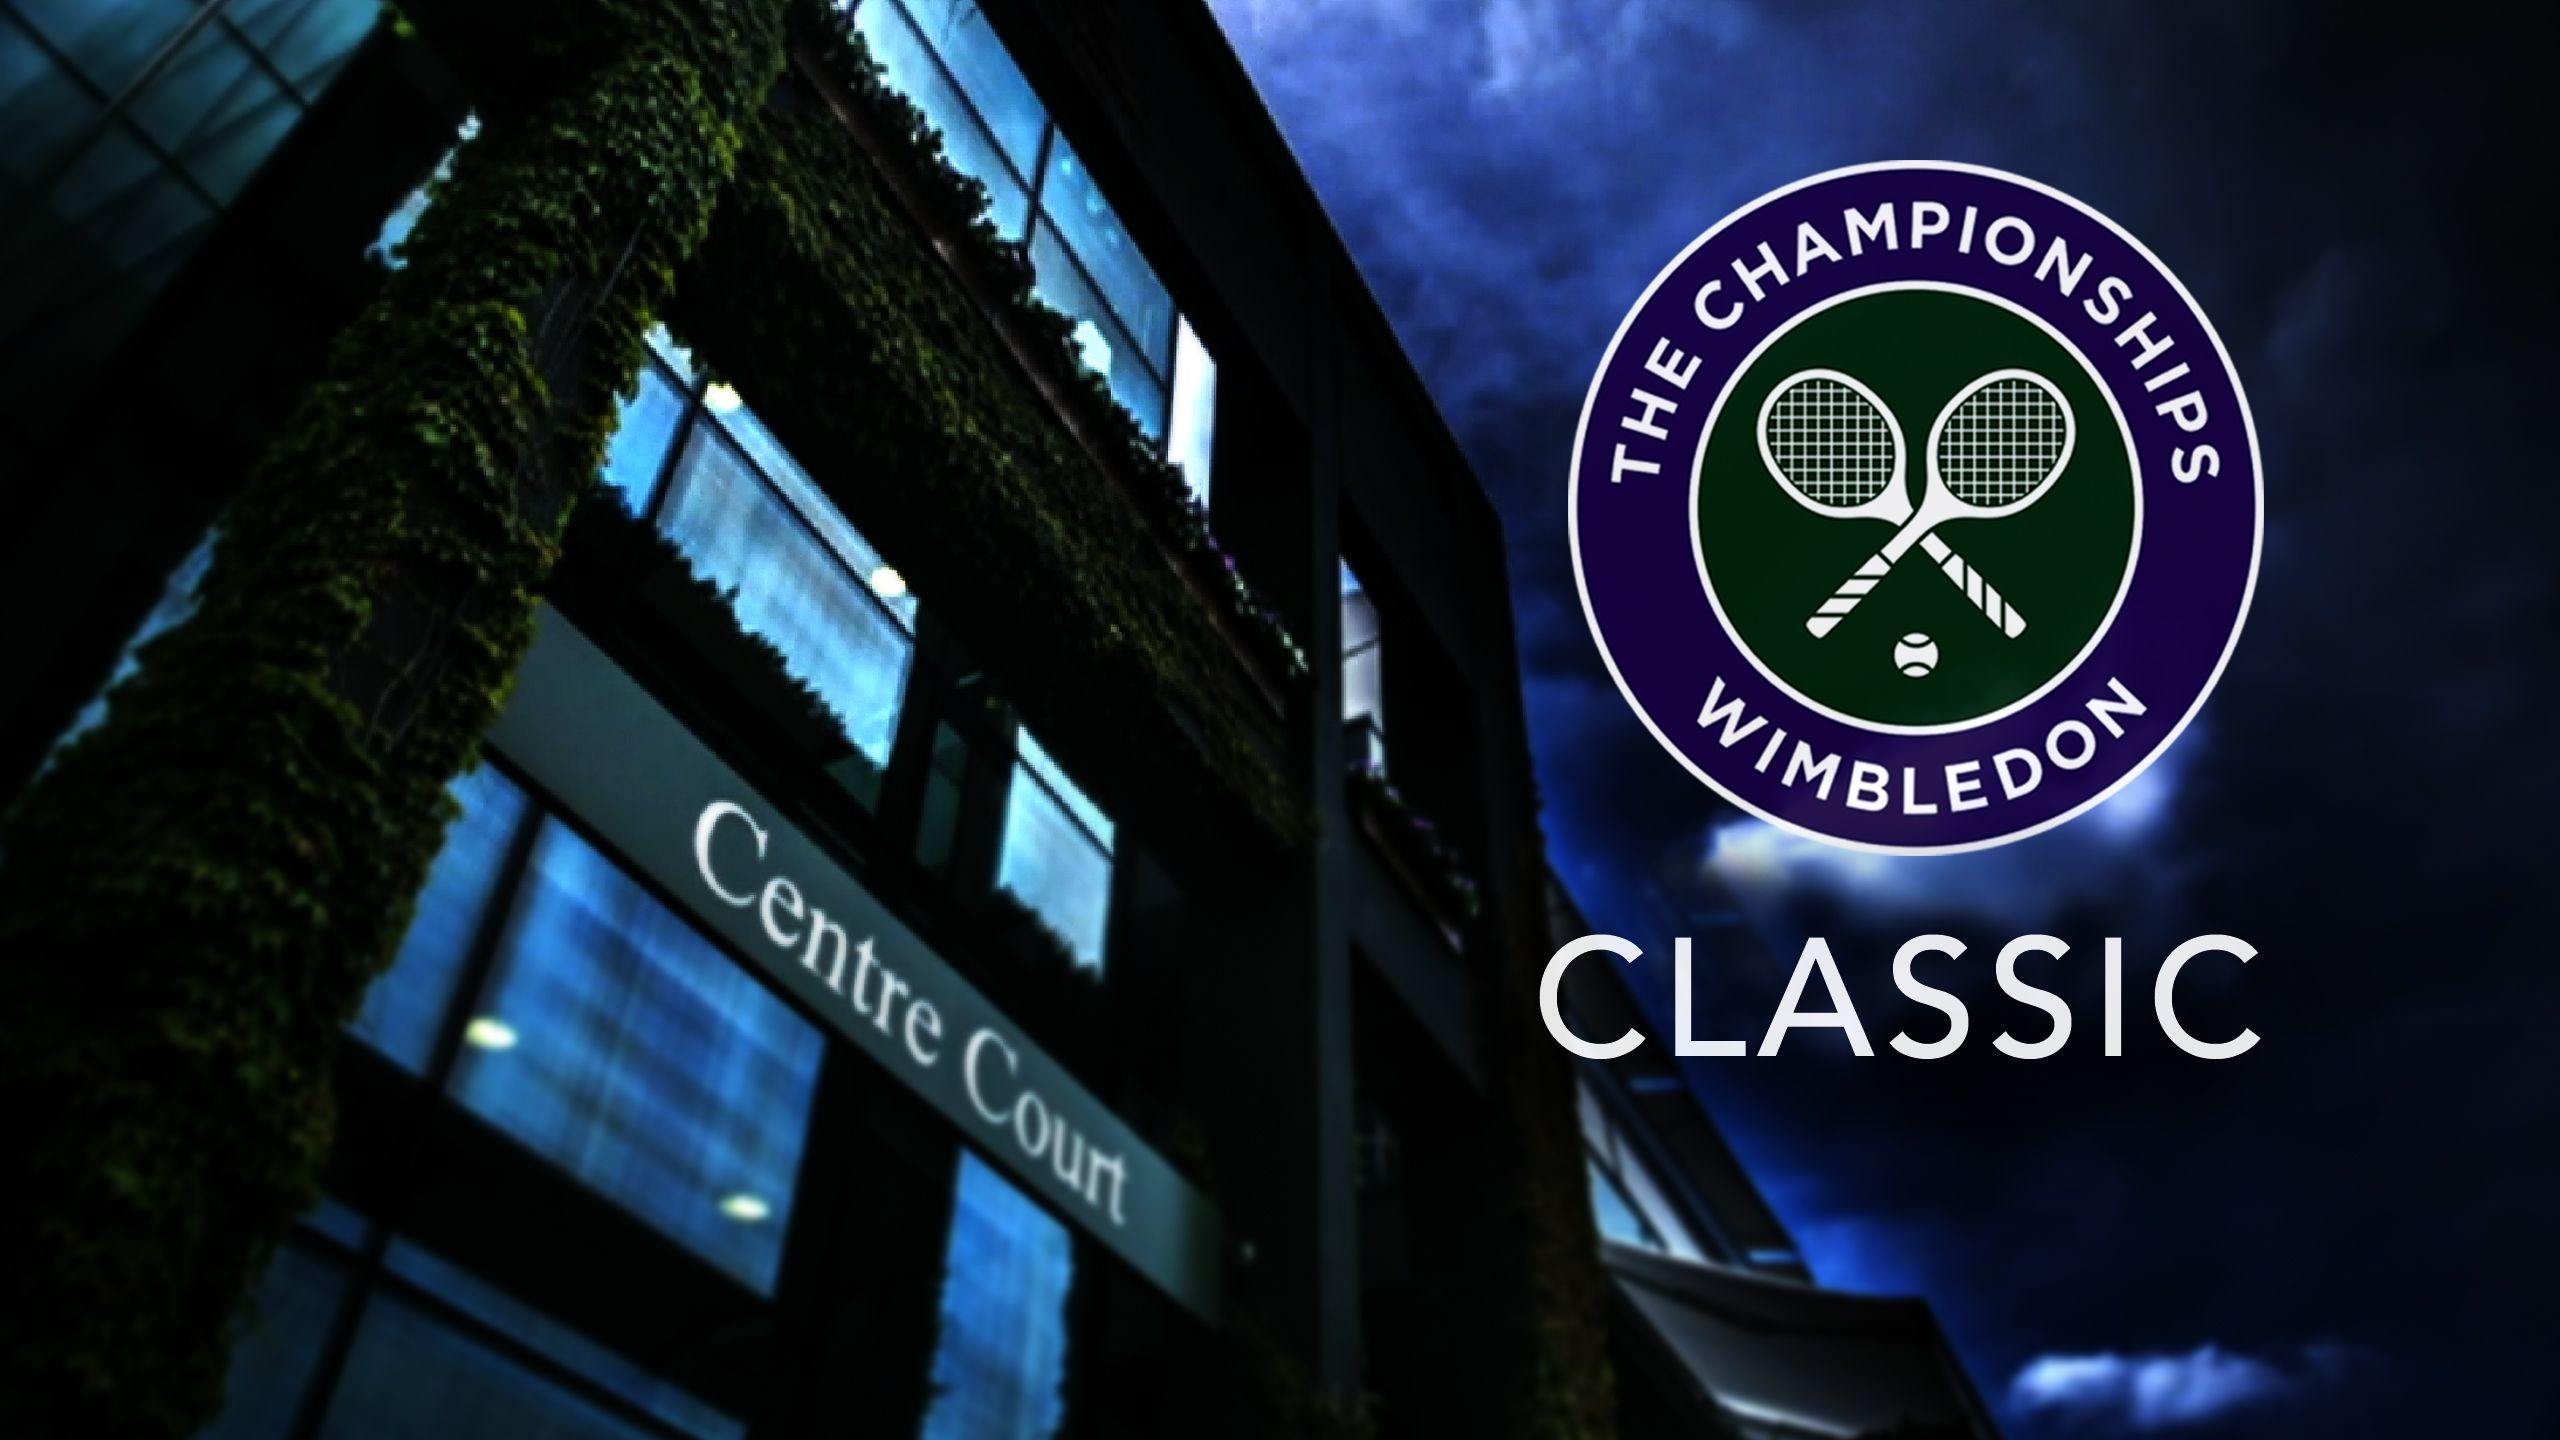 Classic Wimbledon